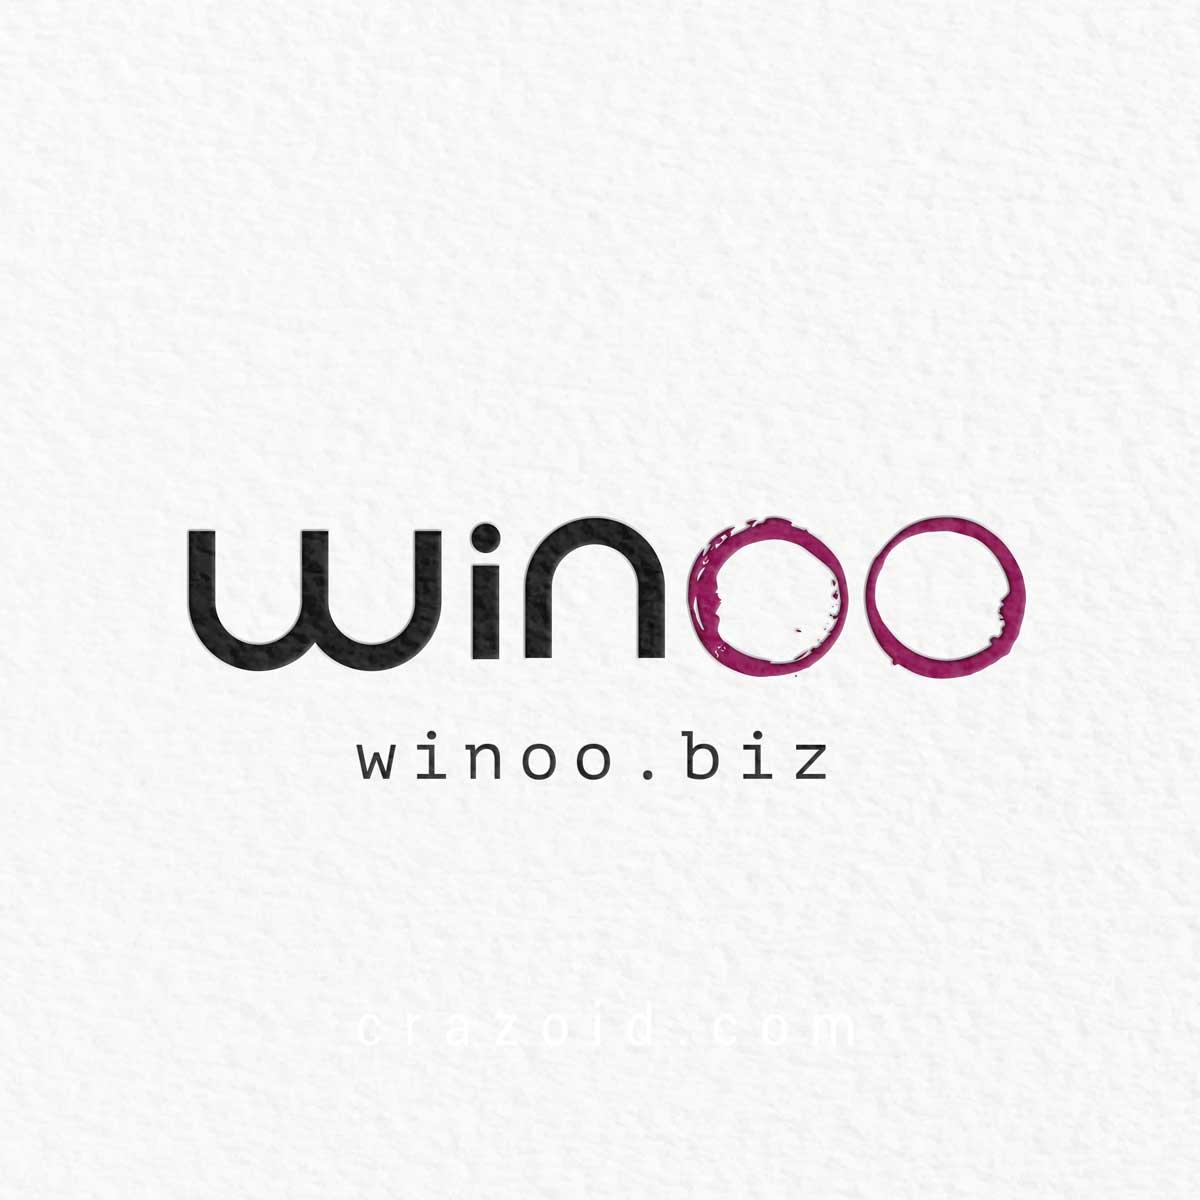 winoo-logo-01